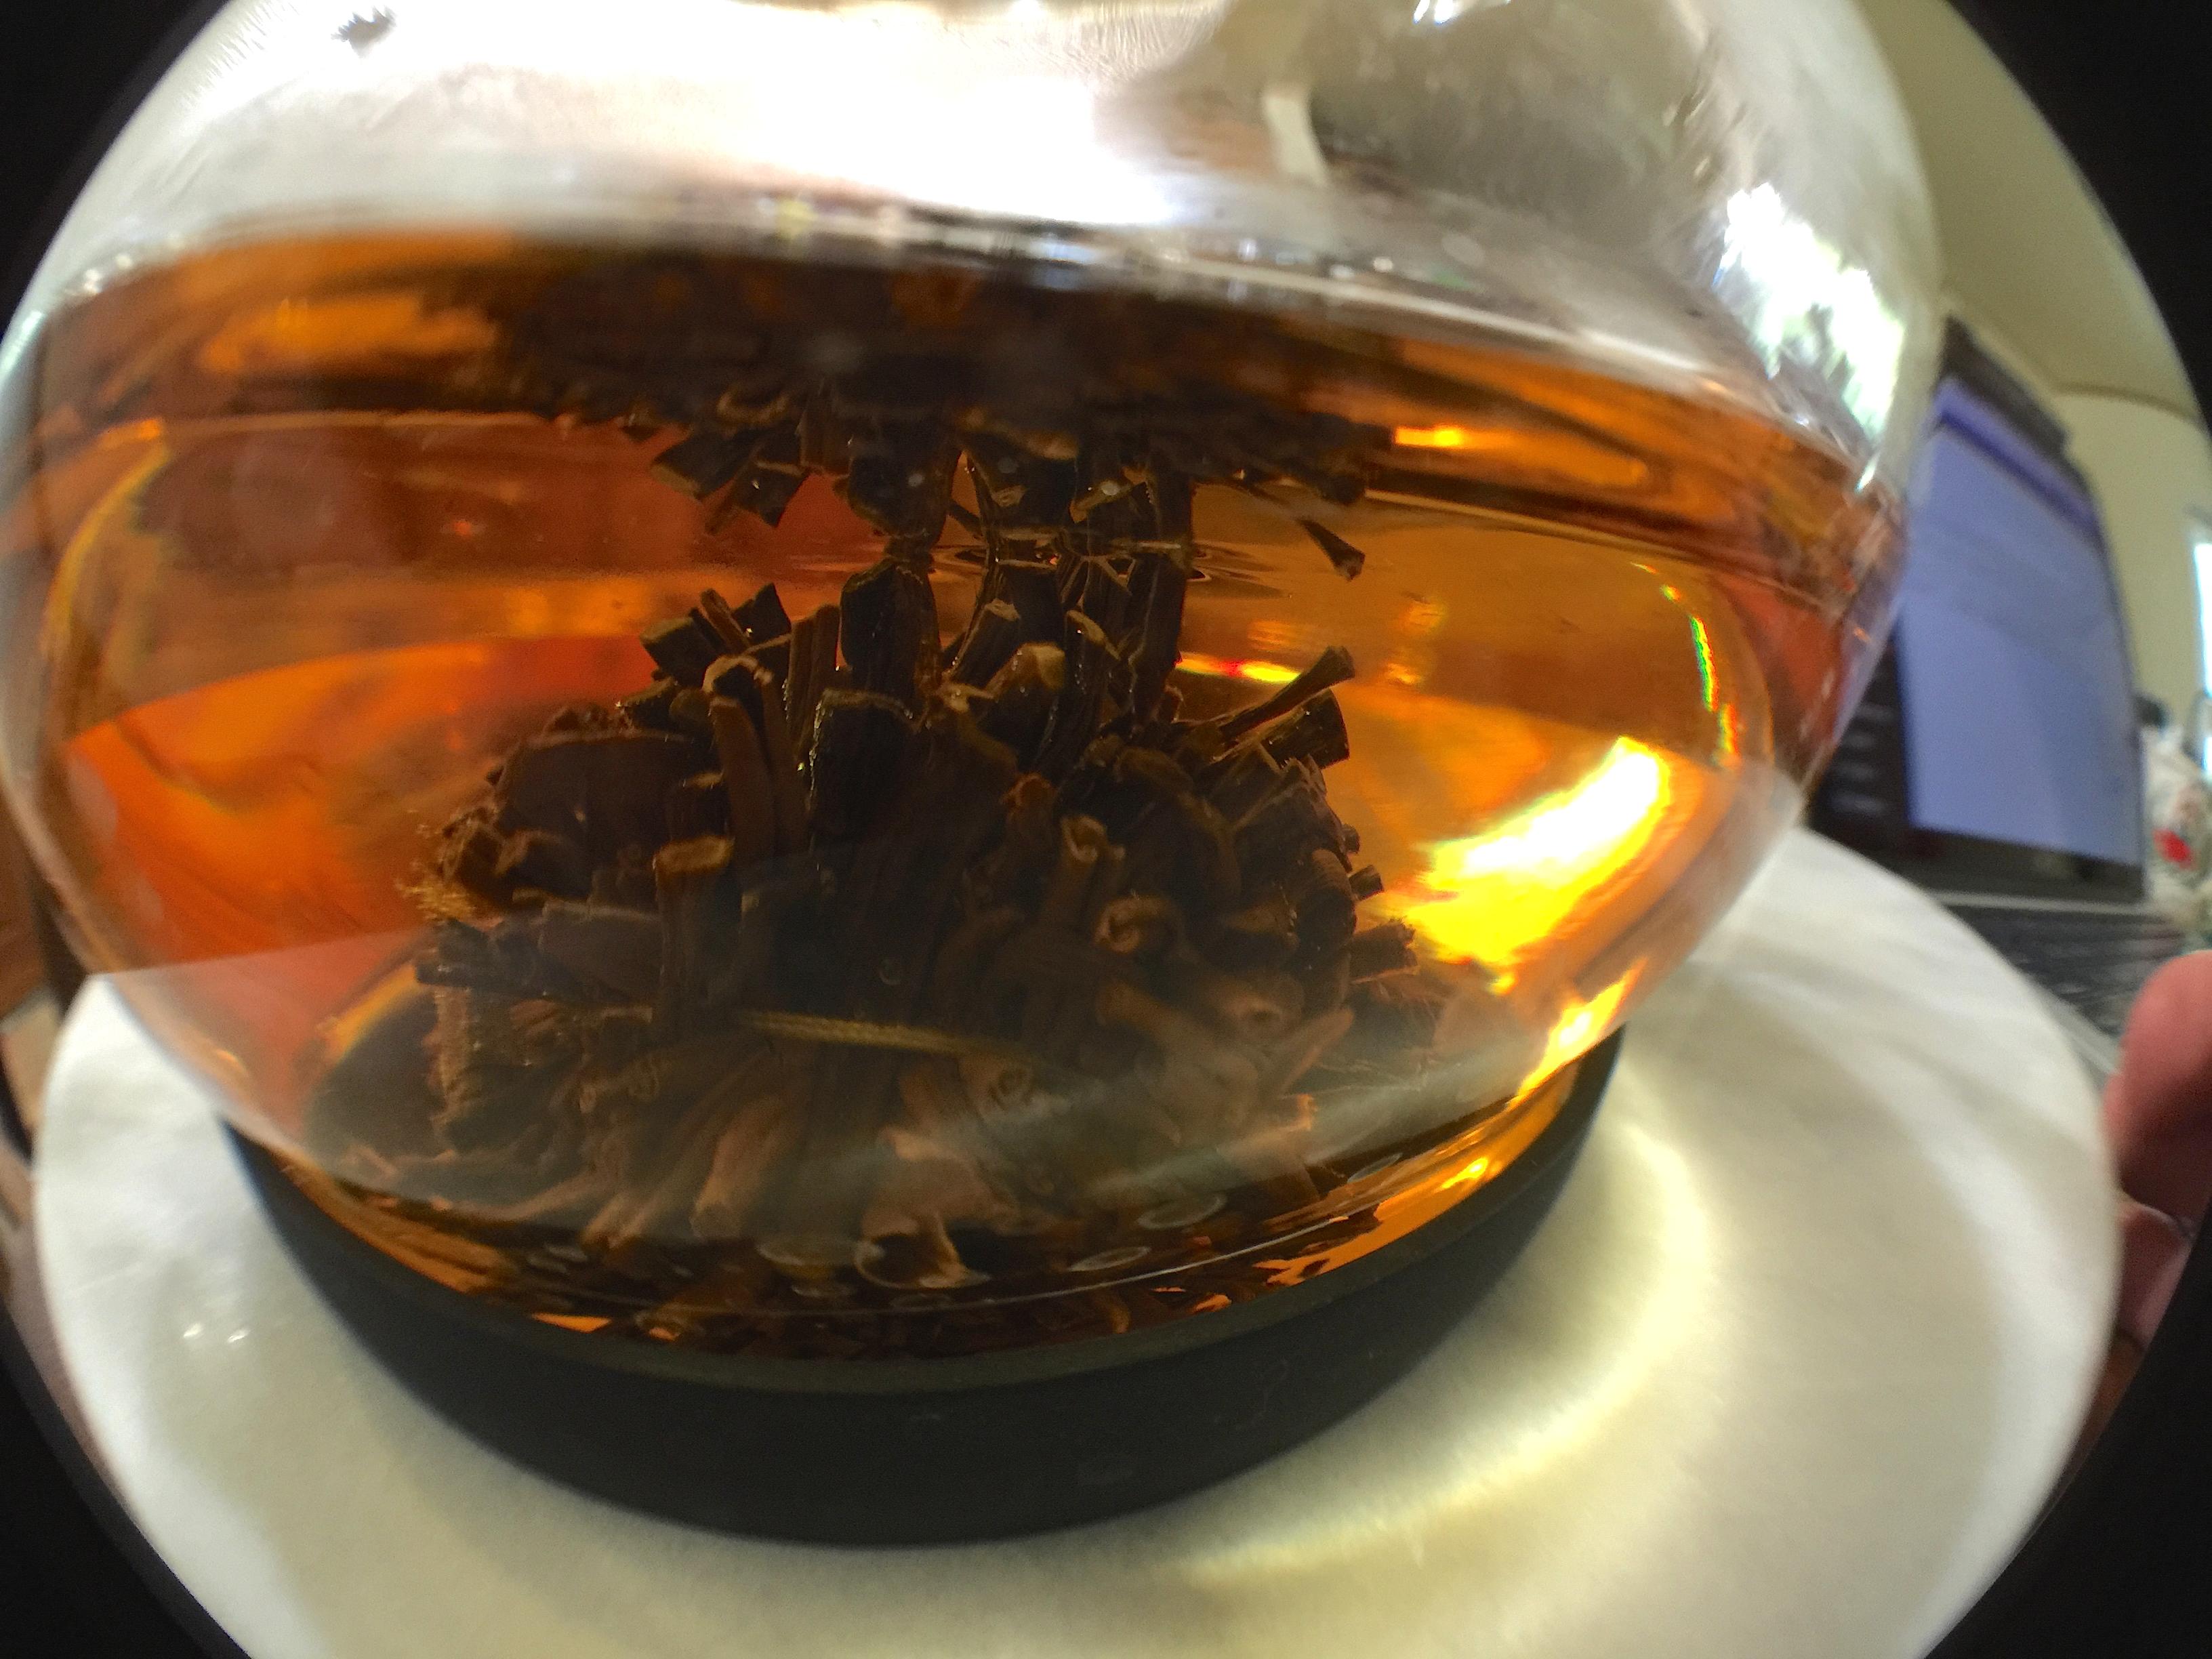 Black Peony (Art of Tea): On DisplayA by Jocilyn Mors is licensed under a Creative Commons Attribution-ShareAlike 4.0 International License.